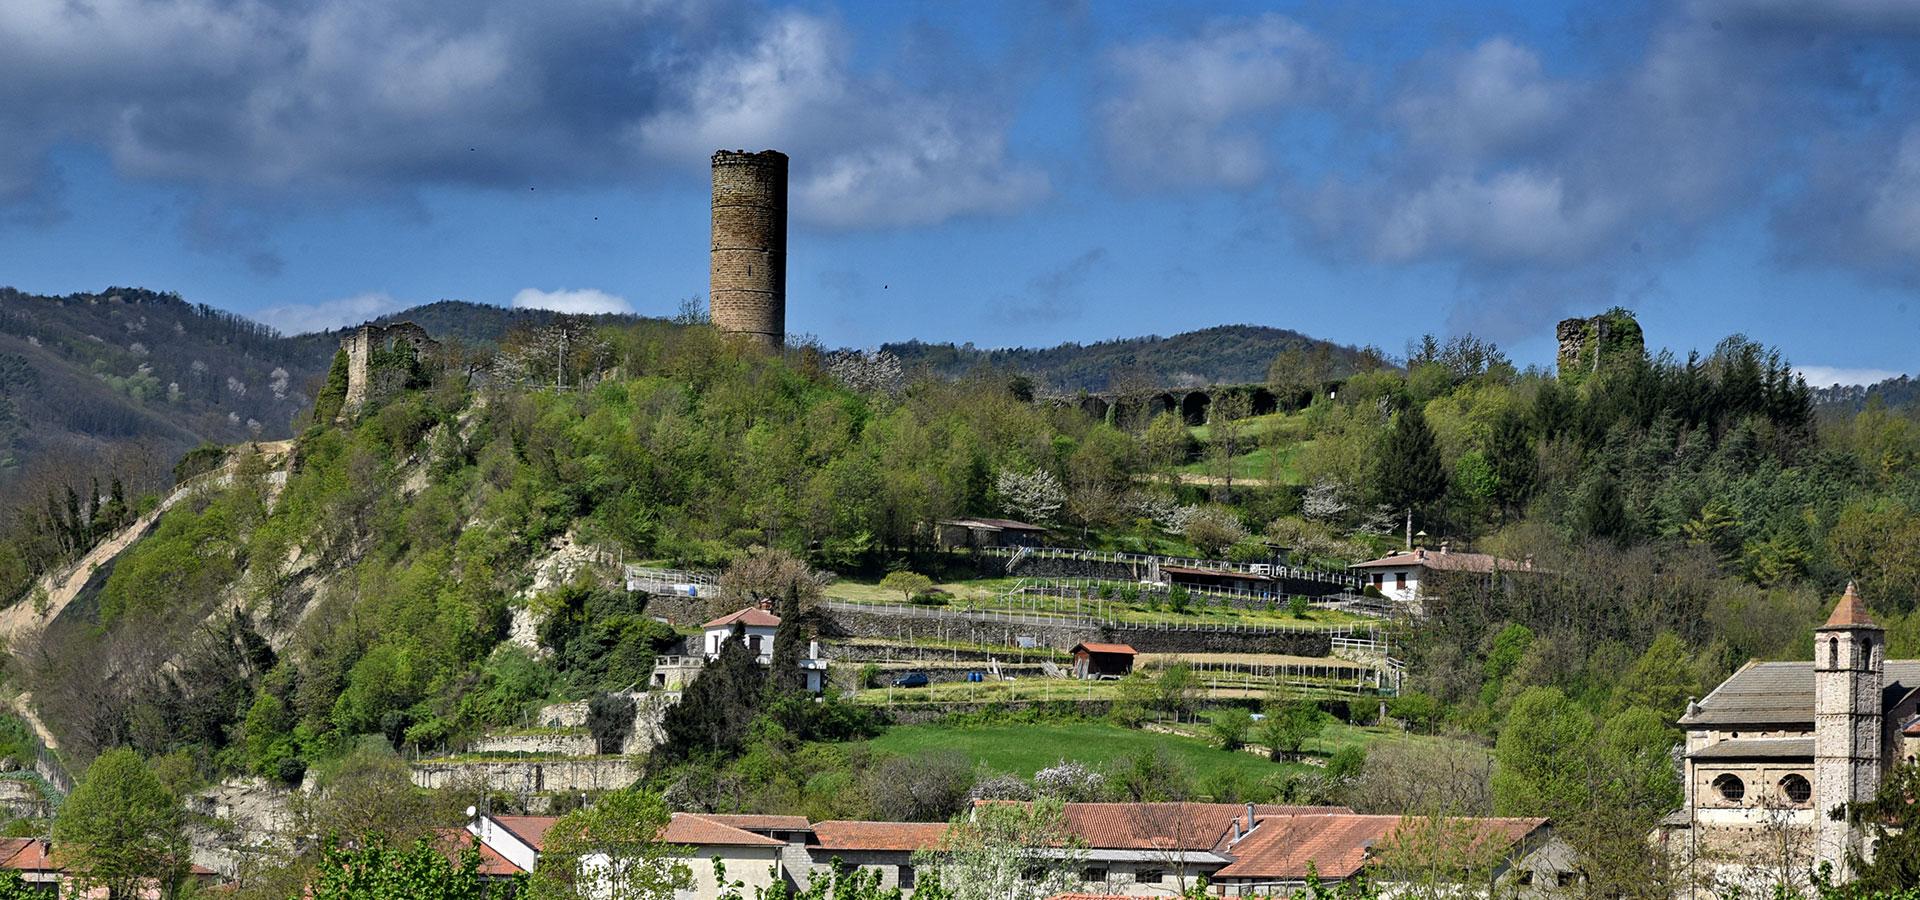 Torre-di-cortemilia-2